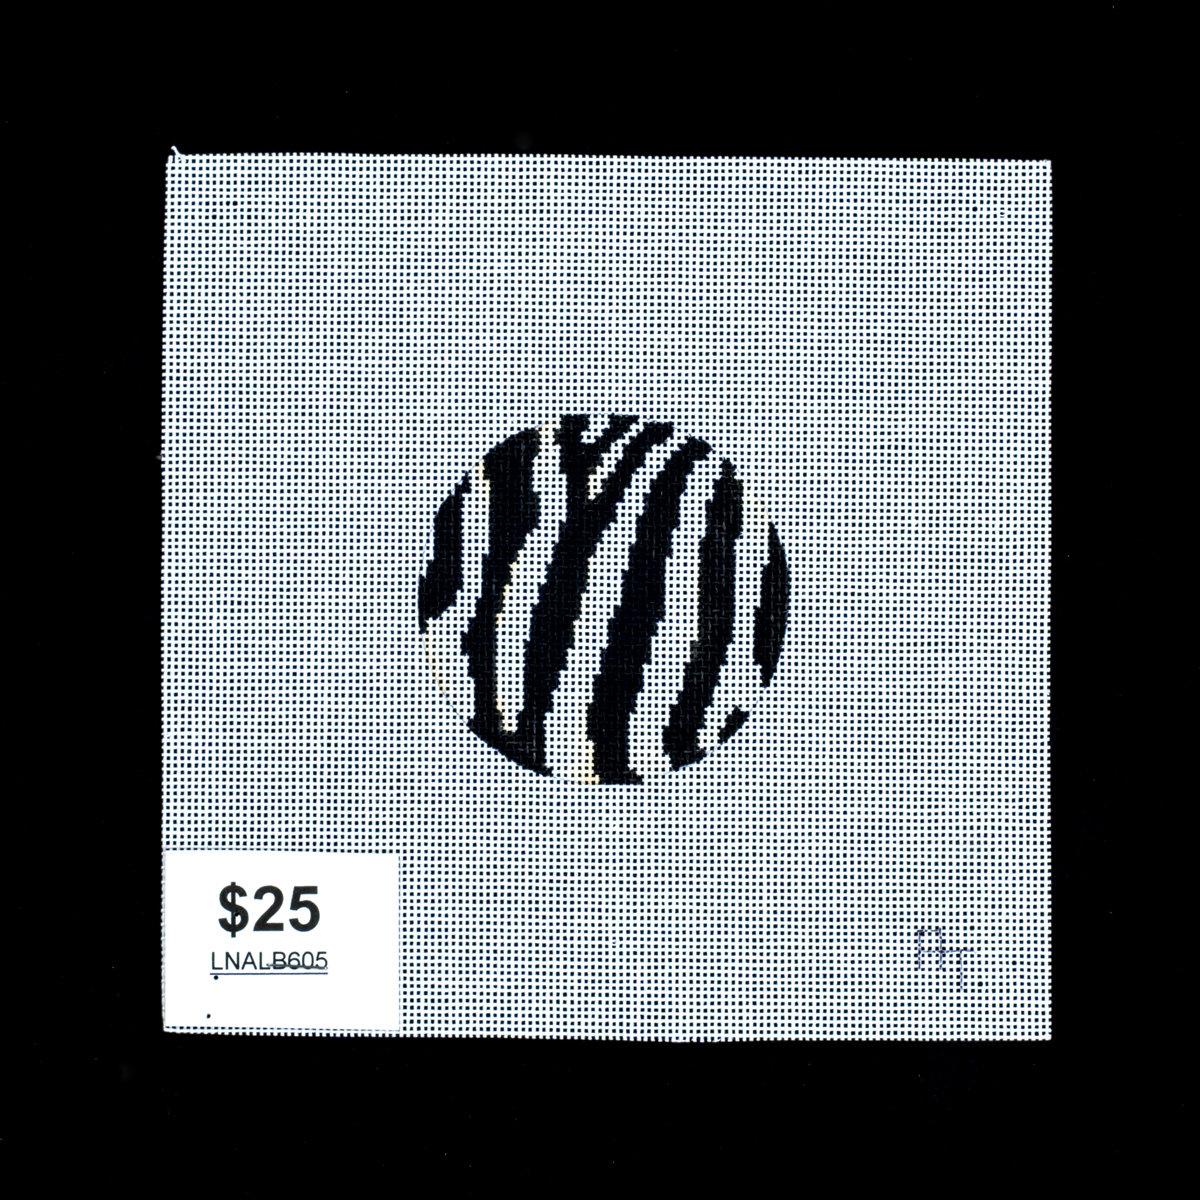 Lee's Needle Arts, Zebra Ornament/Luggage Tag, LNALB605